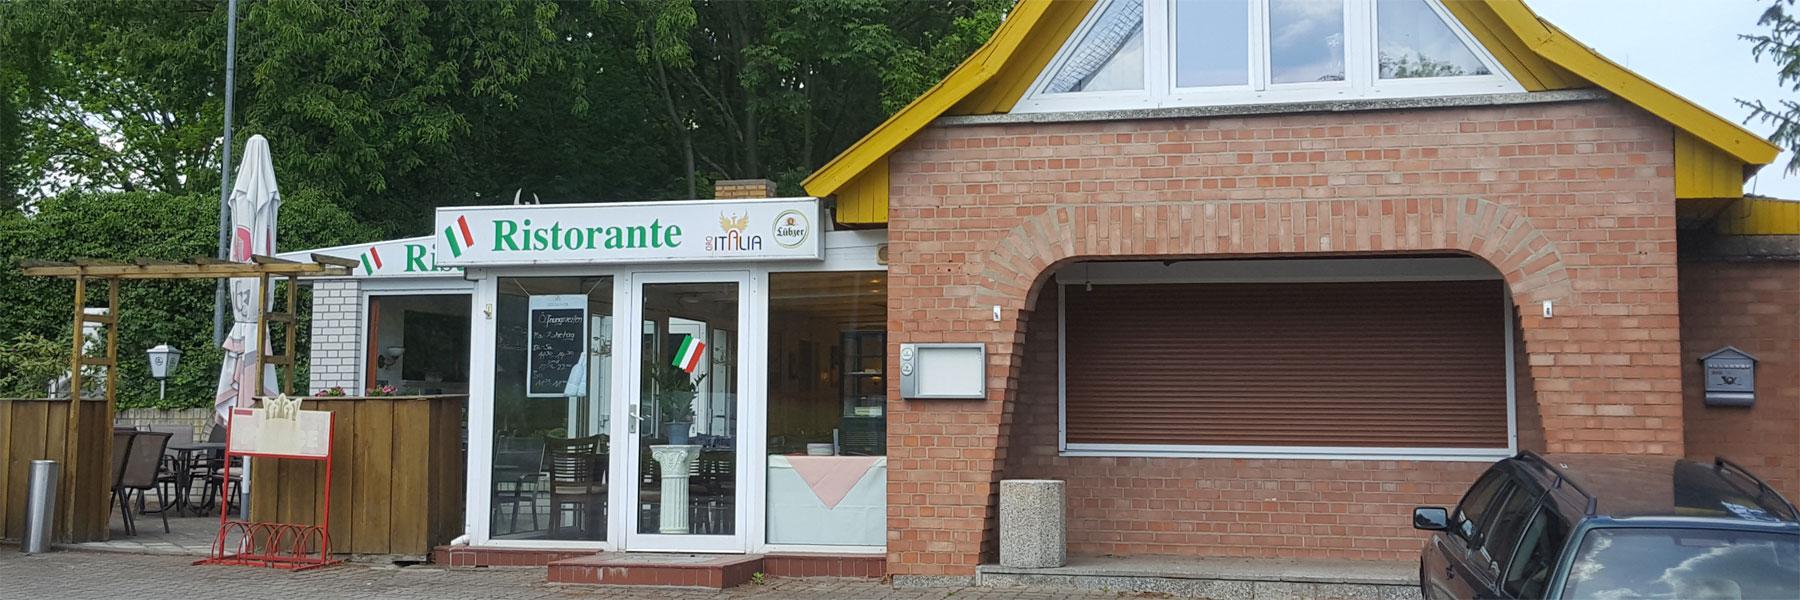 Eingang - Ristorante Ciao Italia